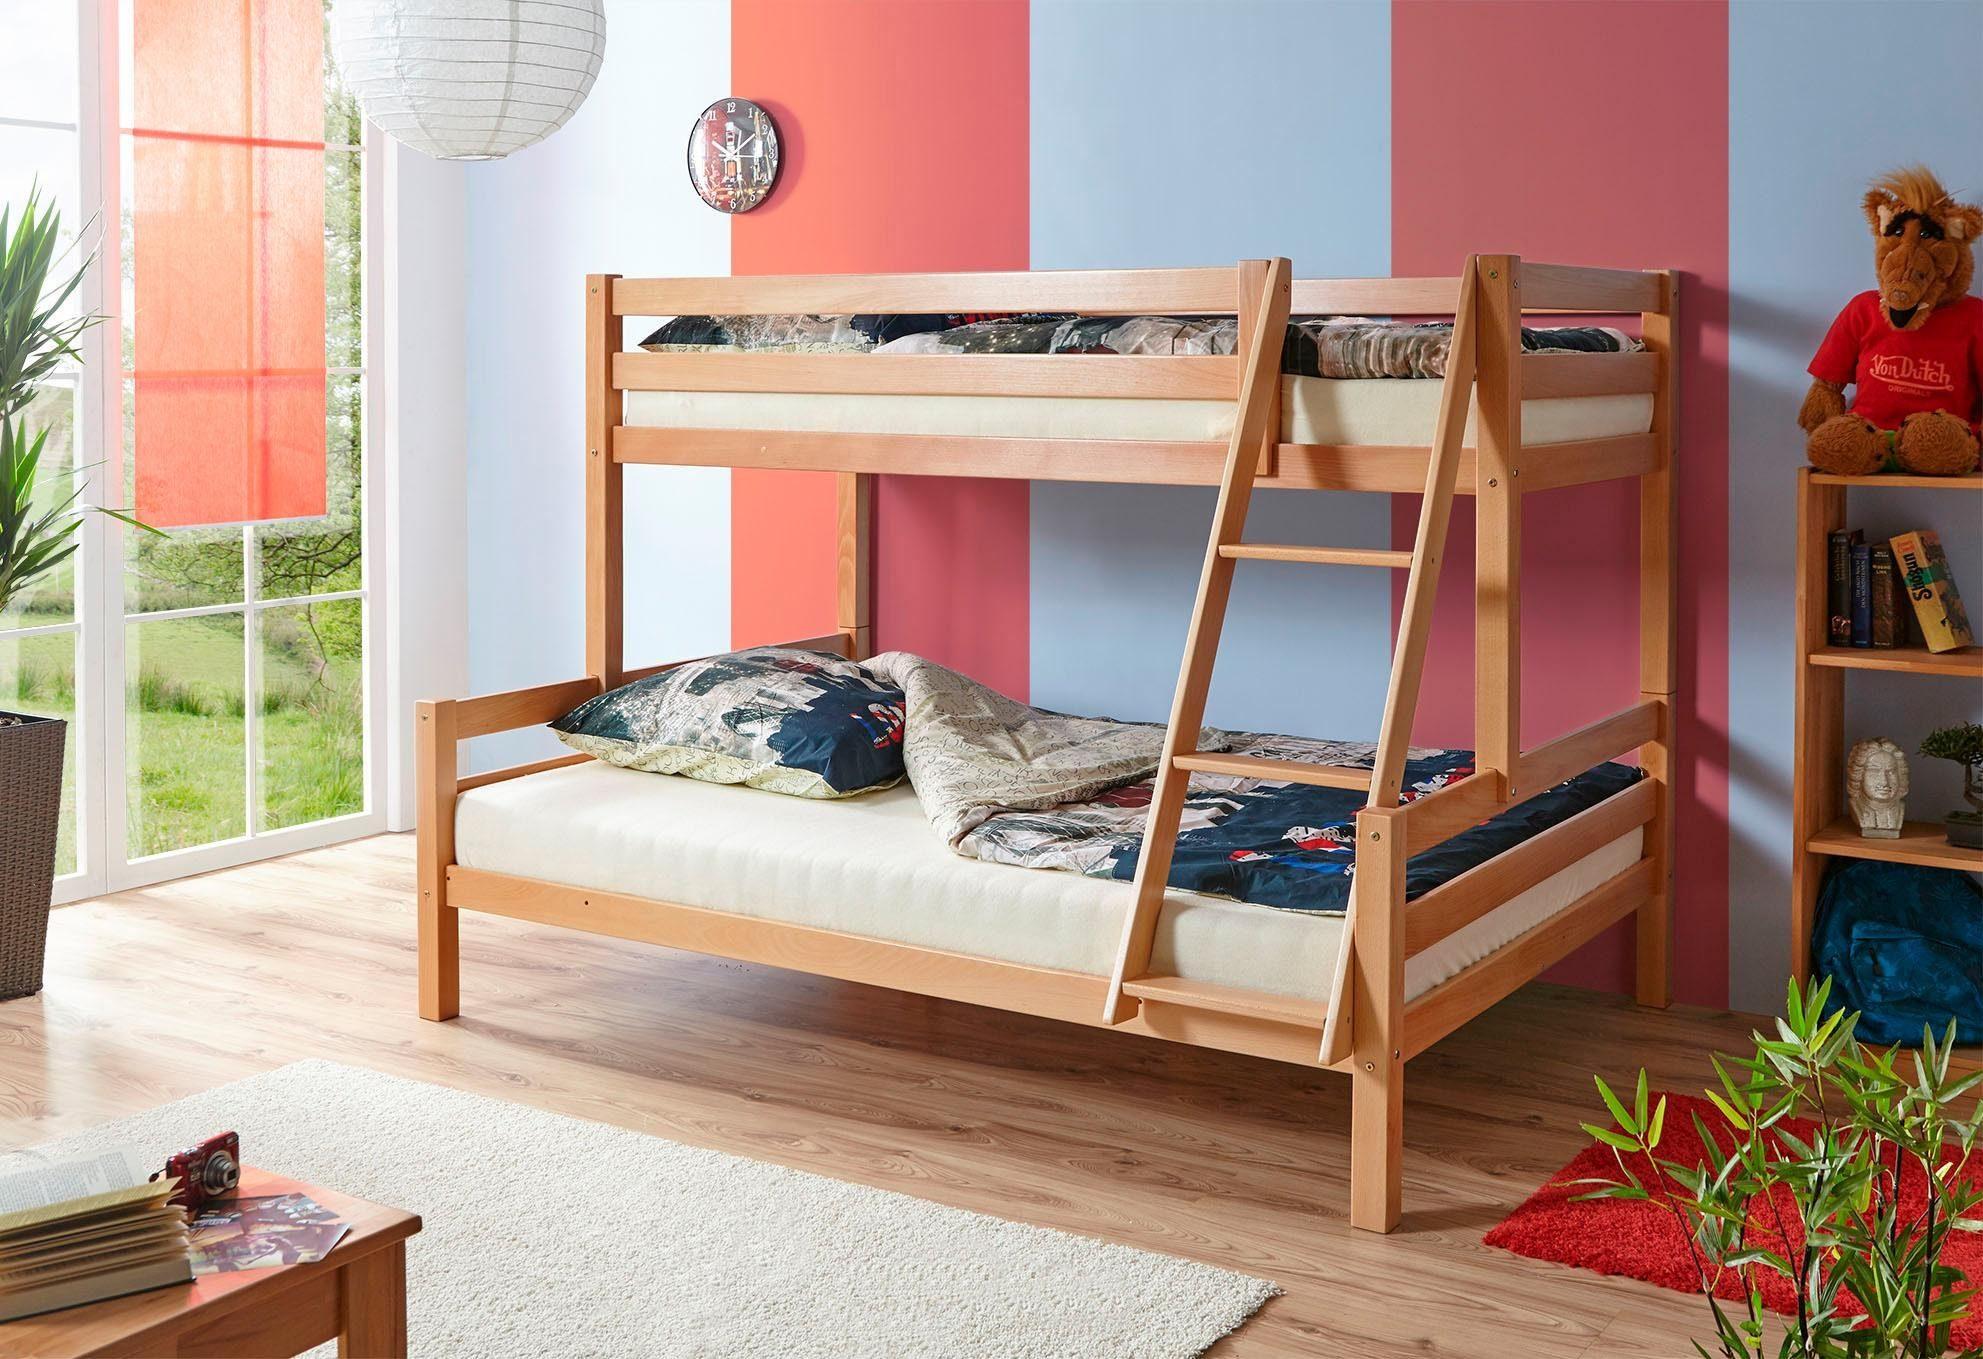 Etagenbett Holz Günstig : Etagenbett doppelstockbett online kaufen stockbett otto